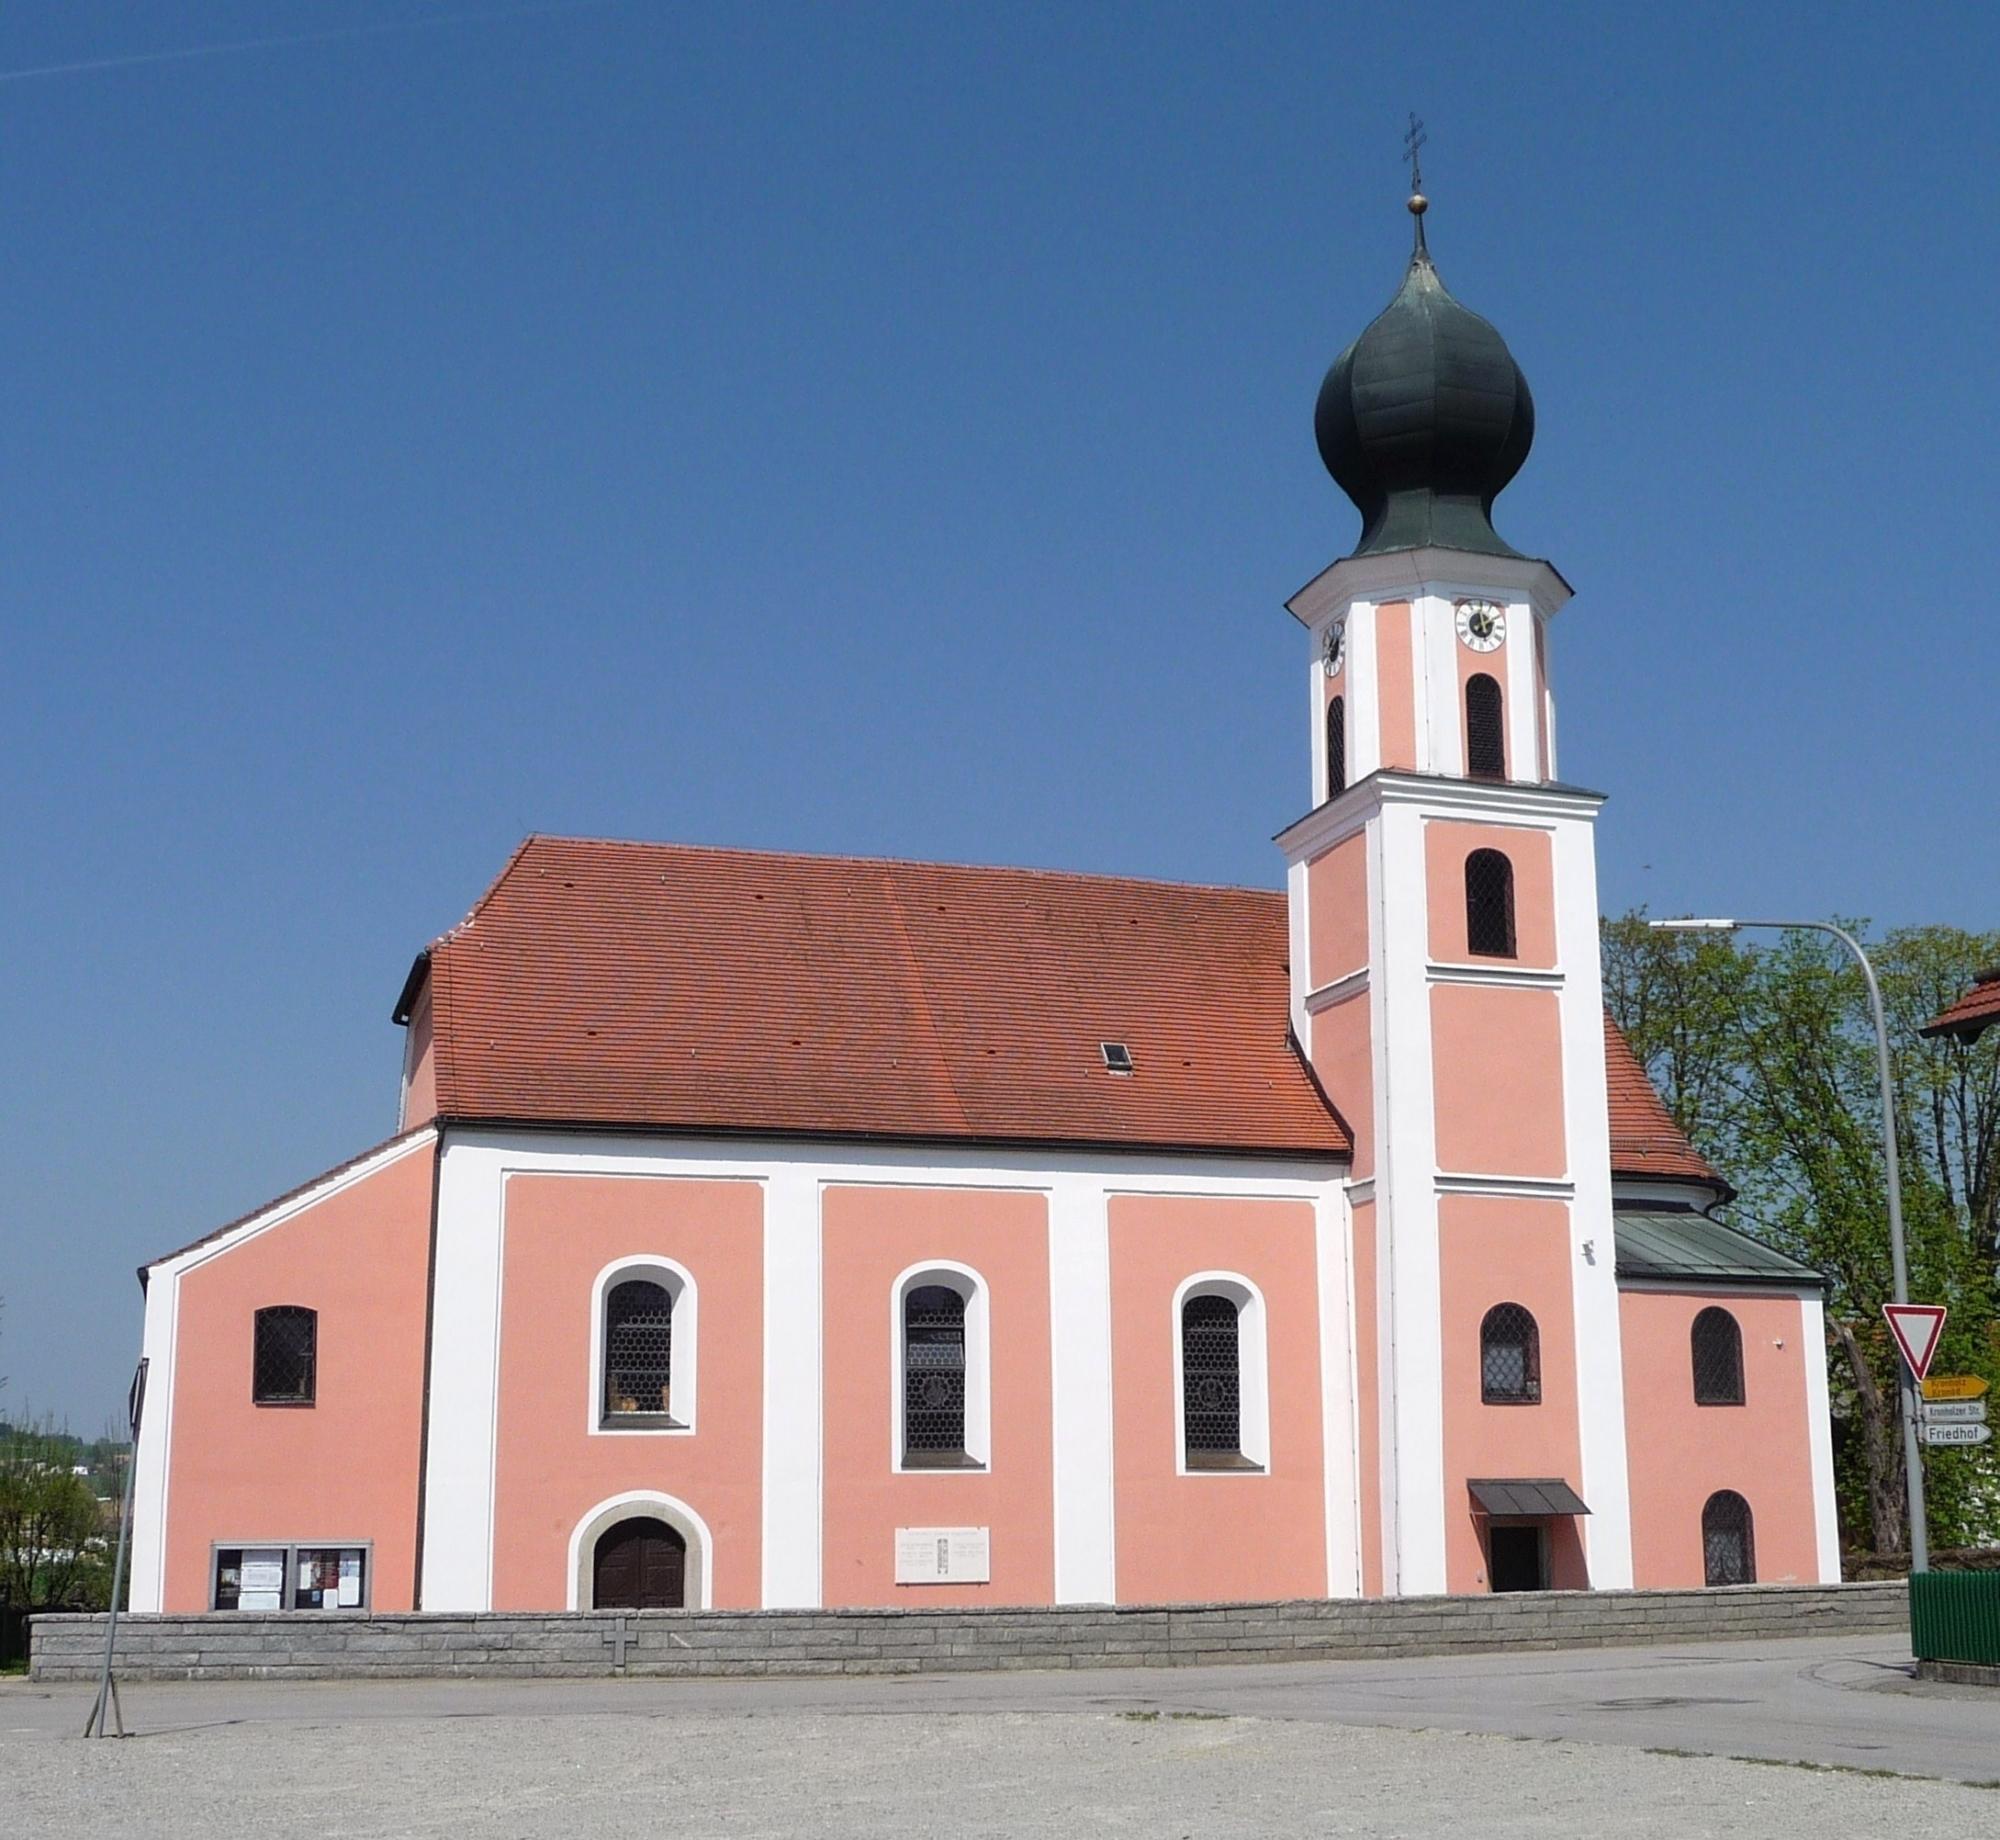 Pfarrkirche Rainding